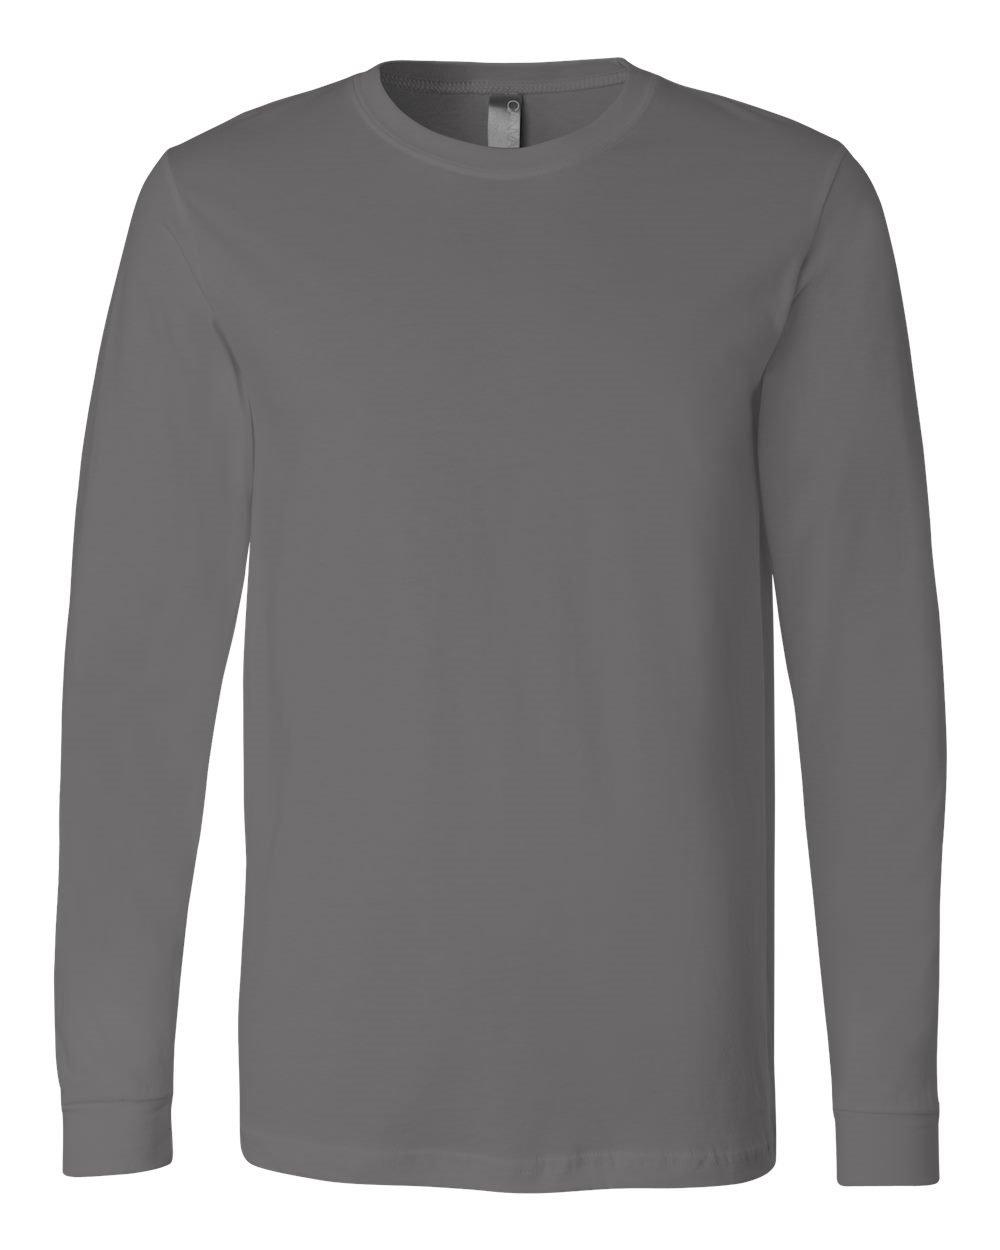 Long Sleeve Shirts - AU Availability